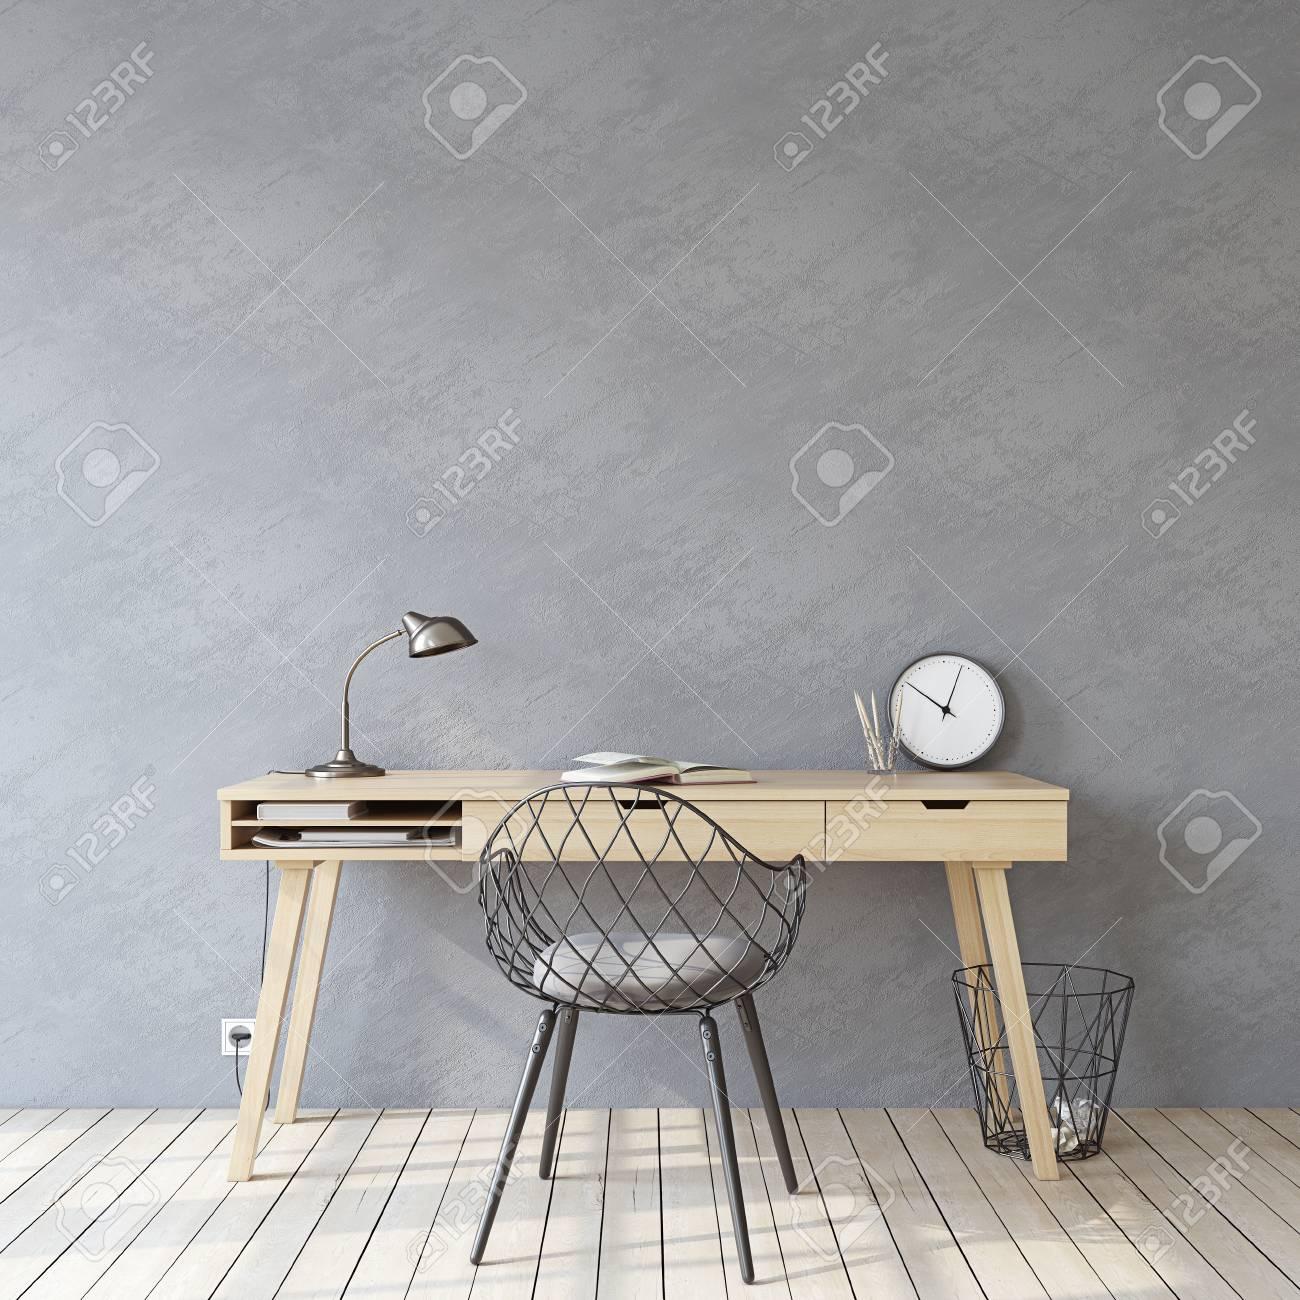 Home office. Interior mockup. Wooden desk near empty gray wall. 3d render. - 121679406